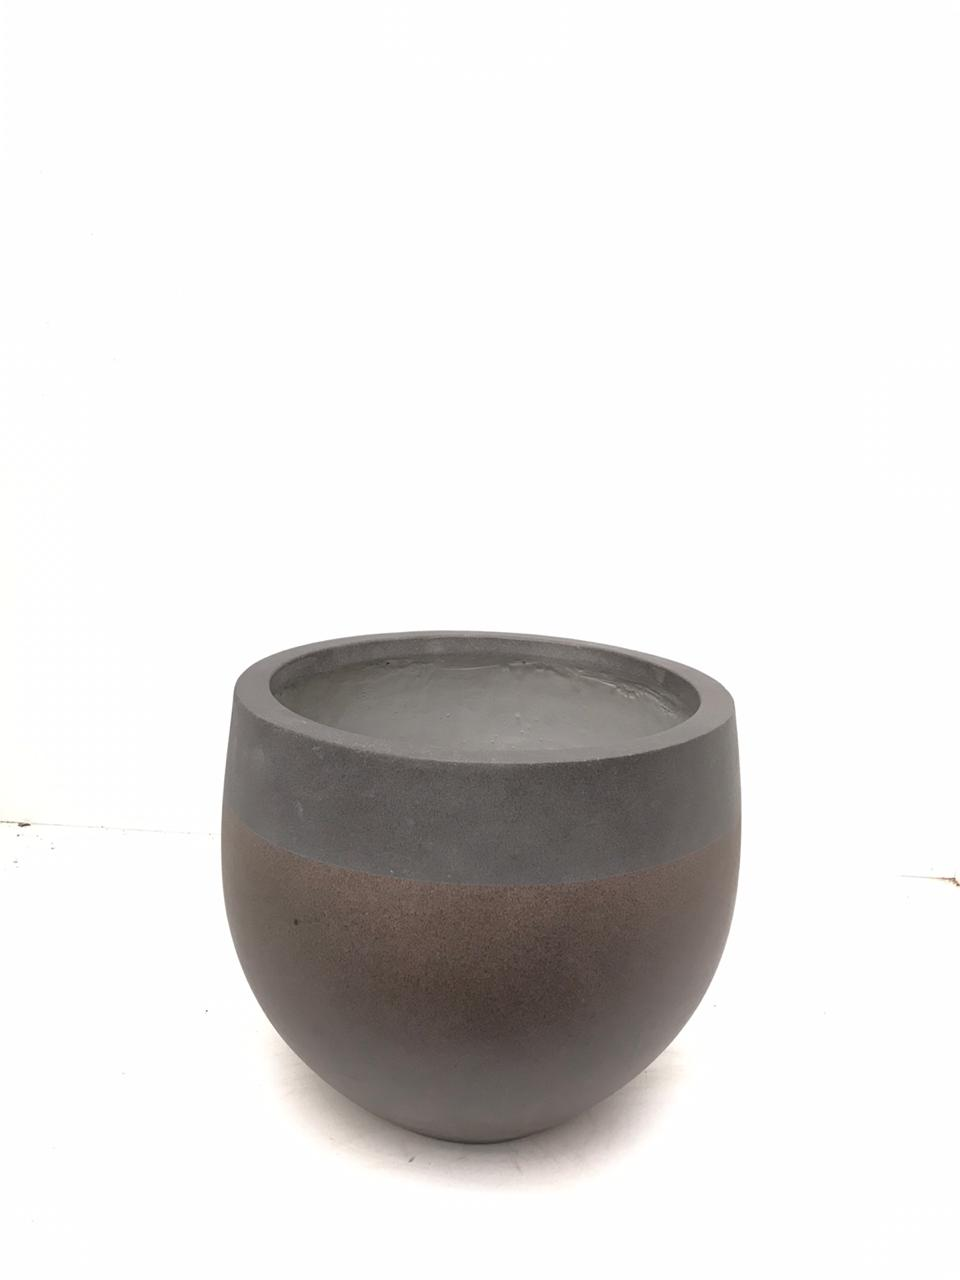 Round Three Quarters Beige Pot - Small Pots & Vases